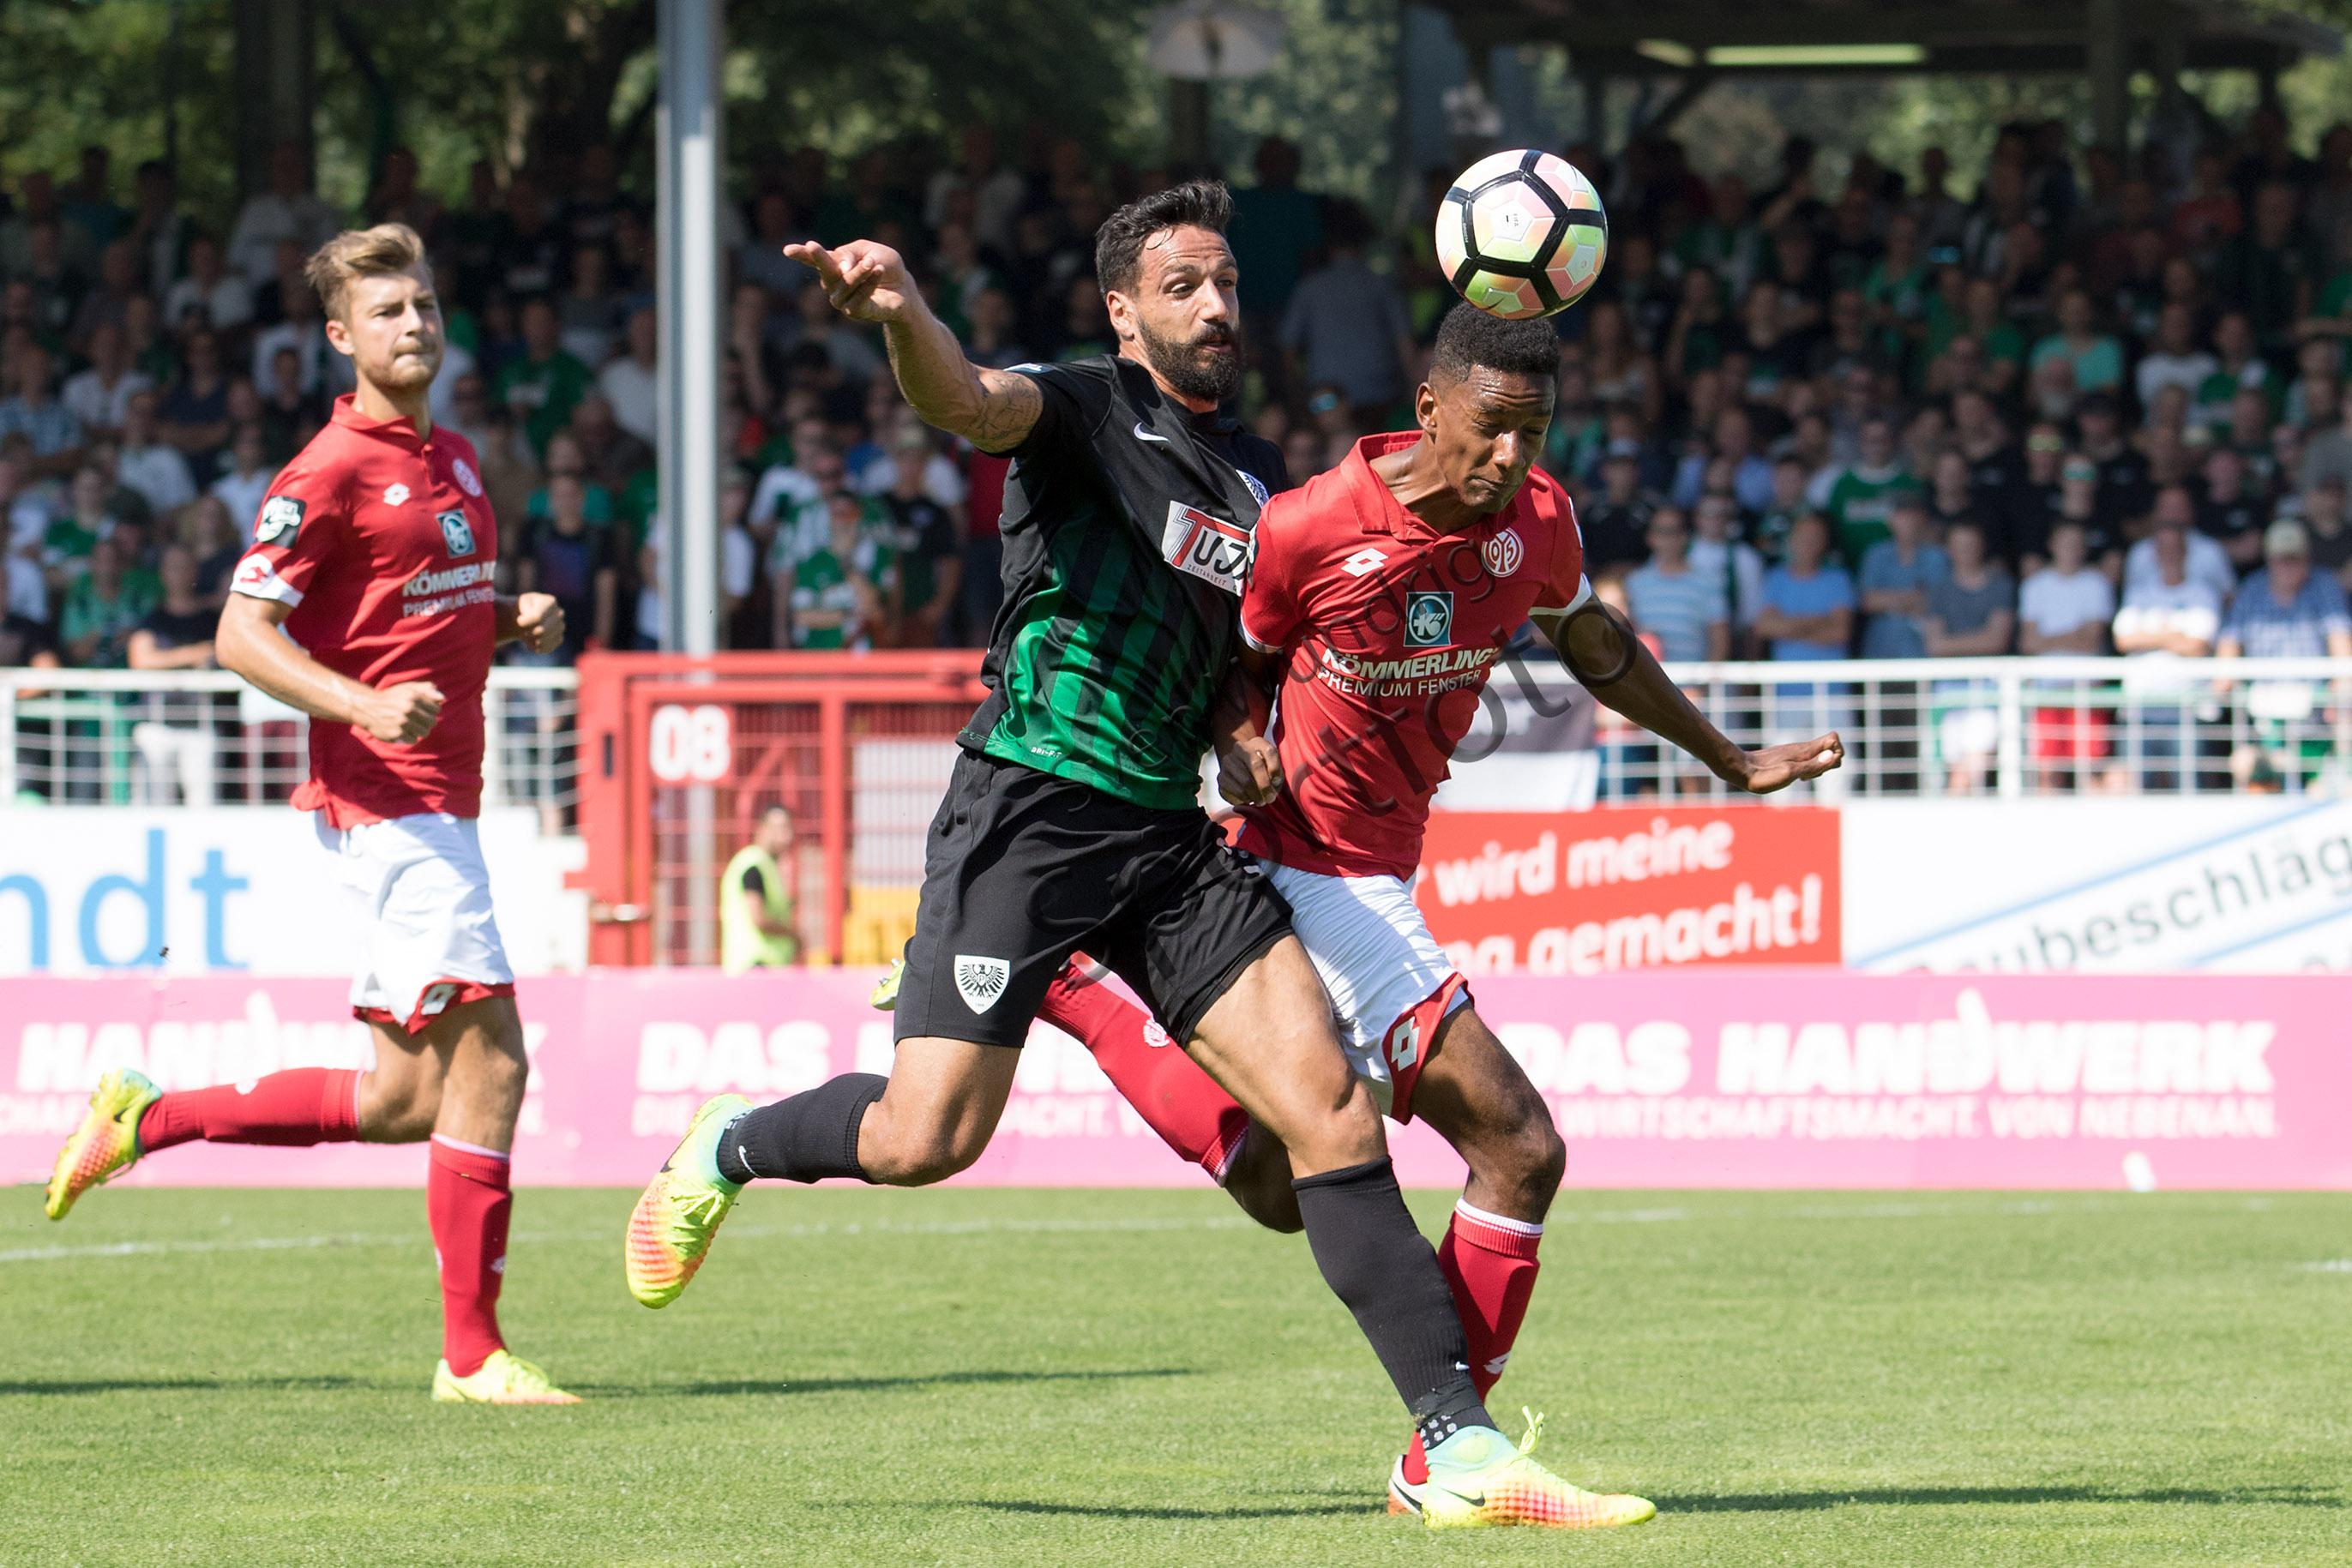 3.Liga - 16/17 - SC Preussen Muenster vs. 1. FSV Mainz 05 II